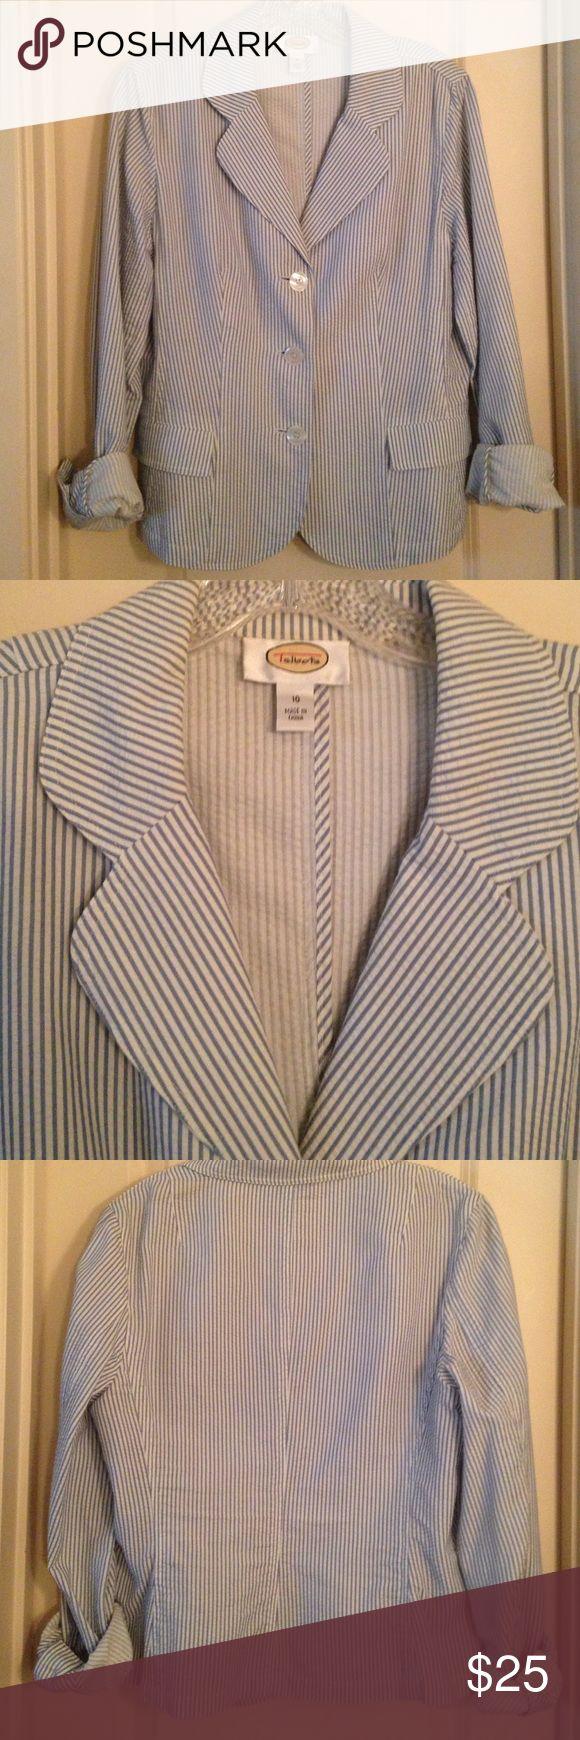 "Seersucker blazer darling seersucker blazer, pleated details, very flattering, shoulder to hem 23"", 100% cotton, looks great w navy skirt or slacks, white jeans, or anything really, nonsmoking home Talbots Jackets & Coats Blazers"